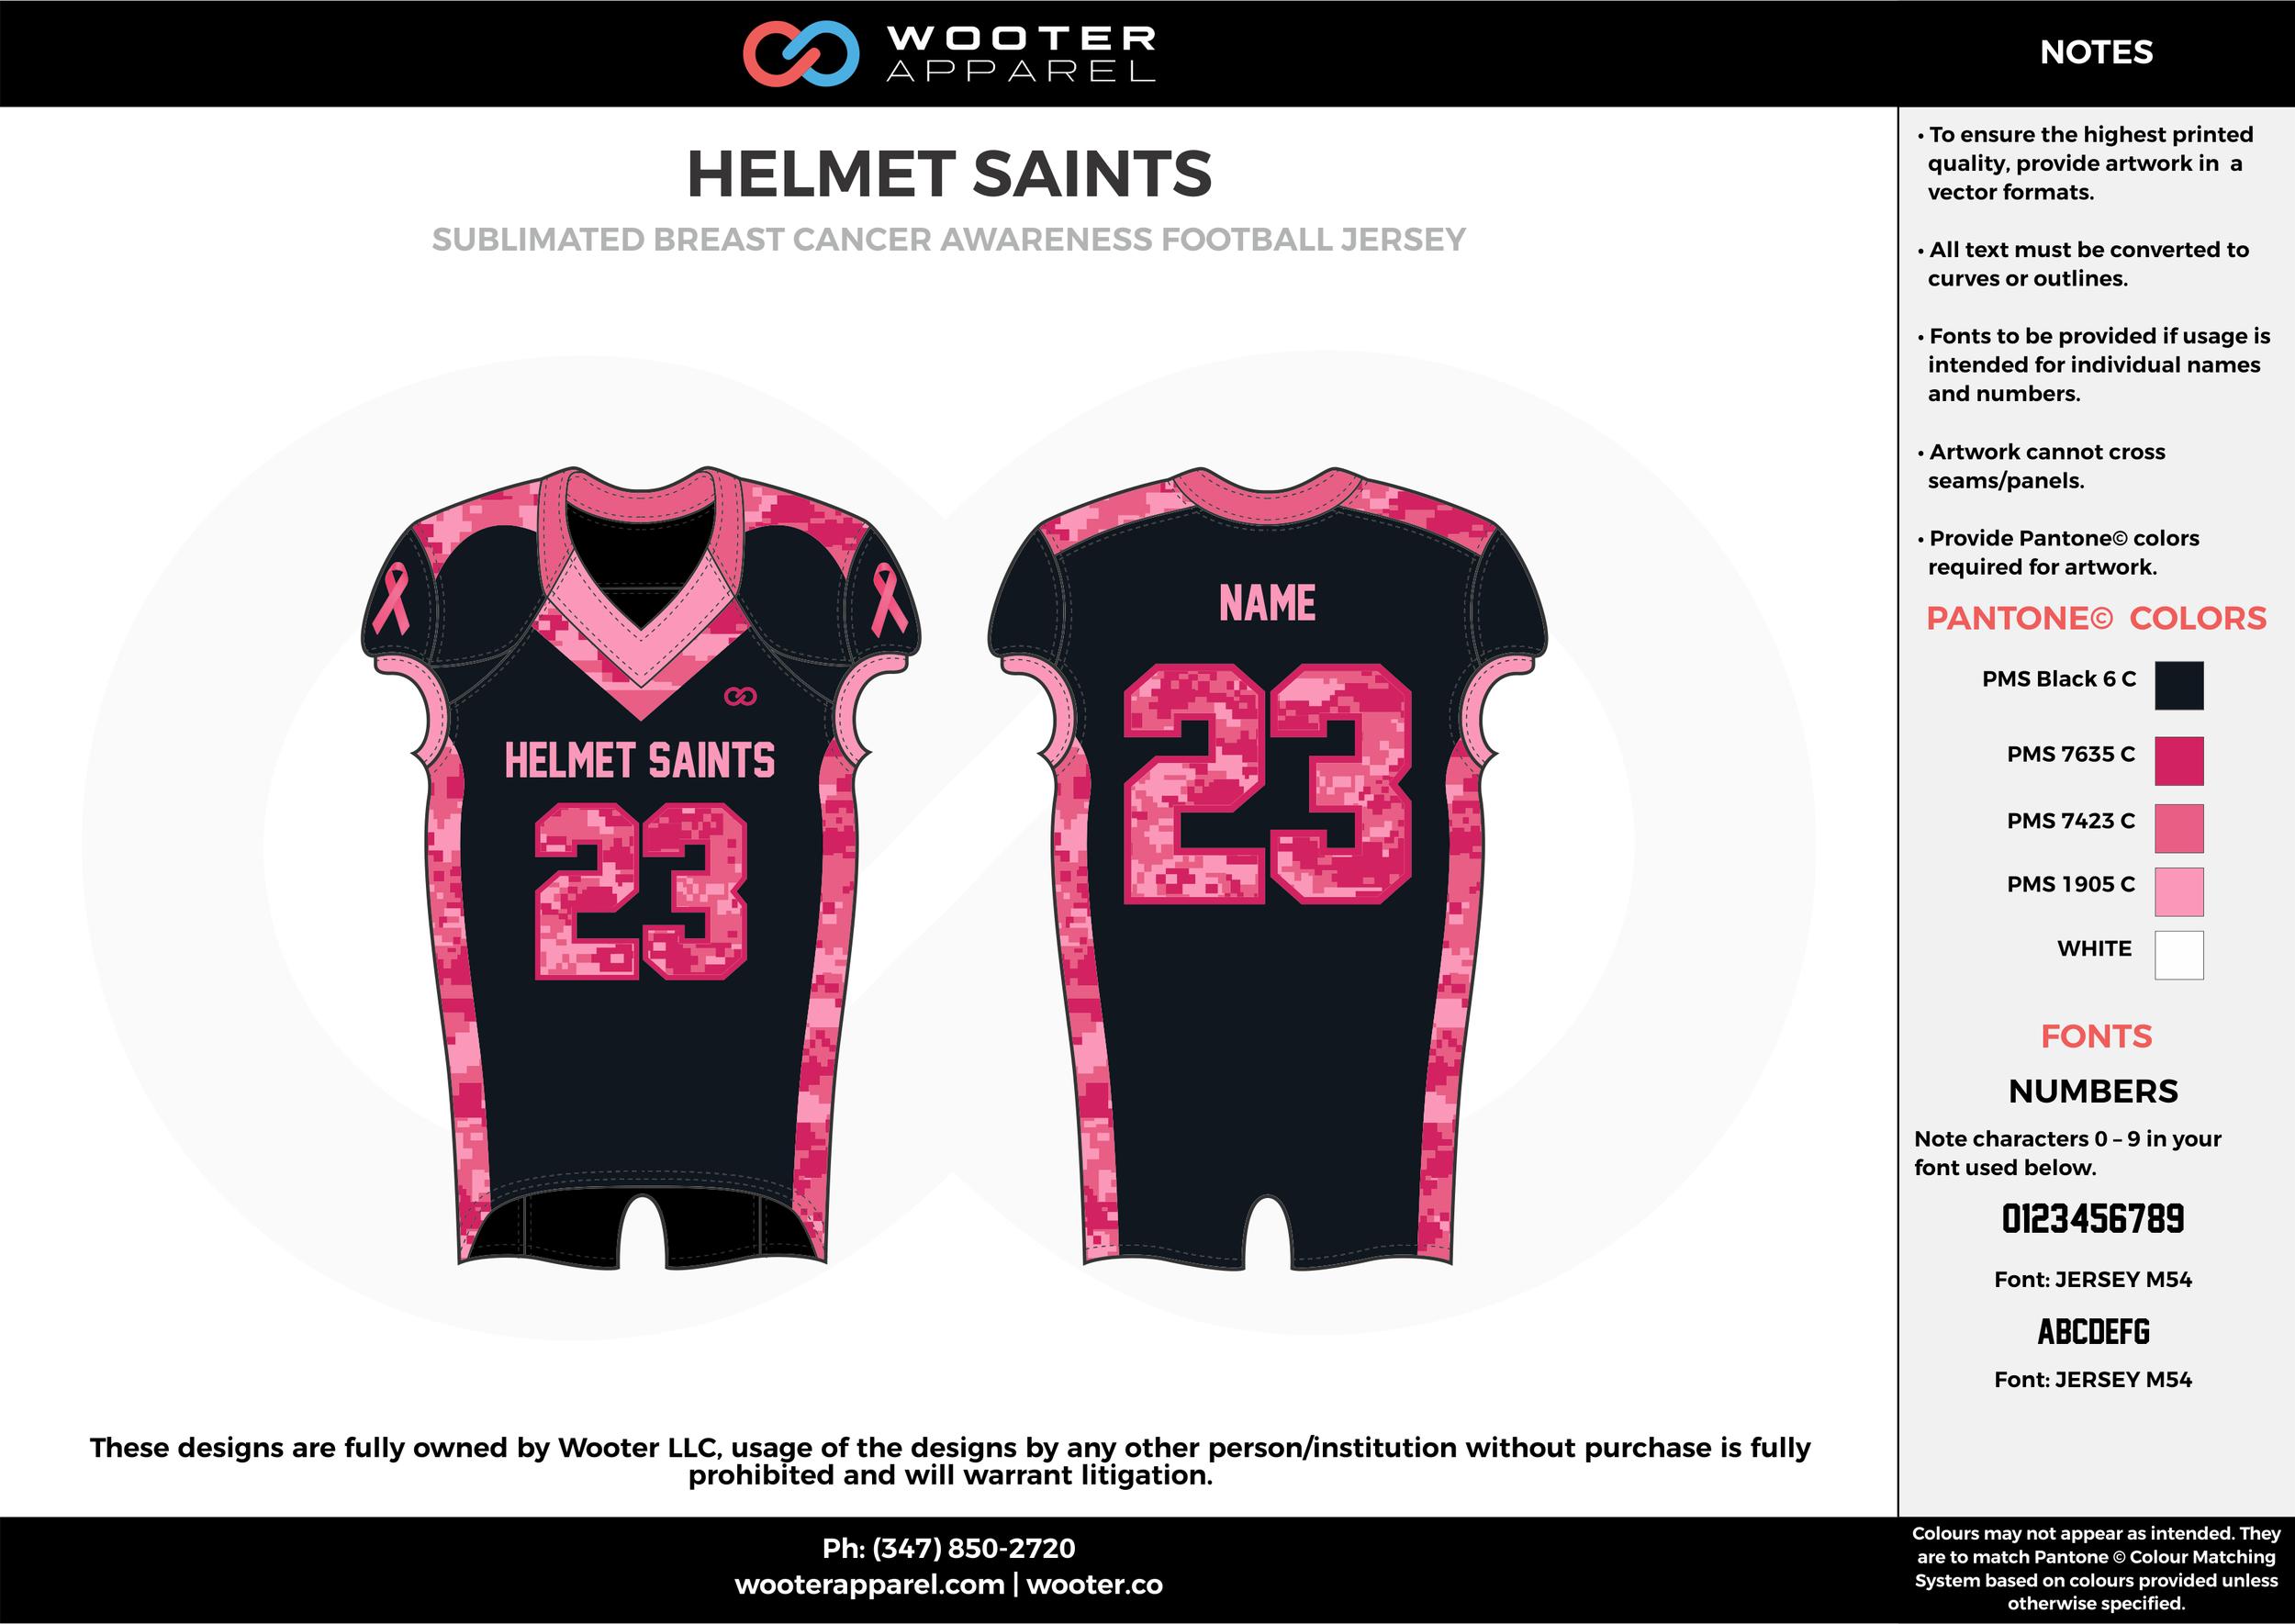 HELMET SAINTS black pink white football uniforms jerseys top